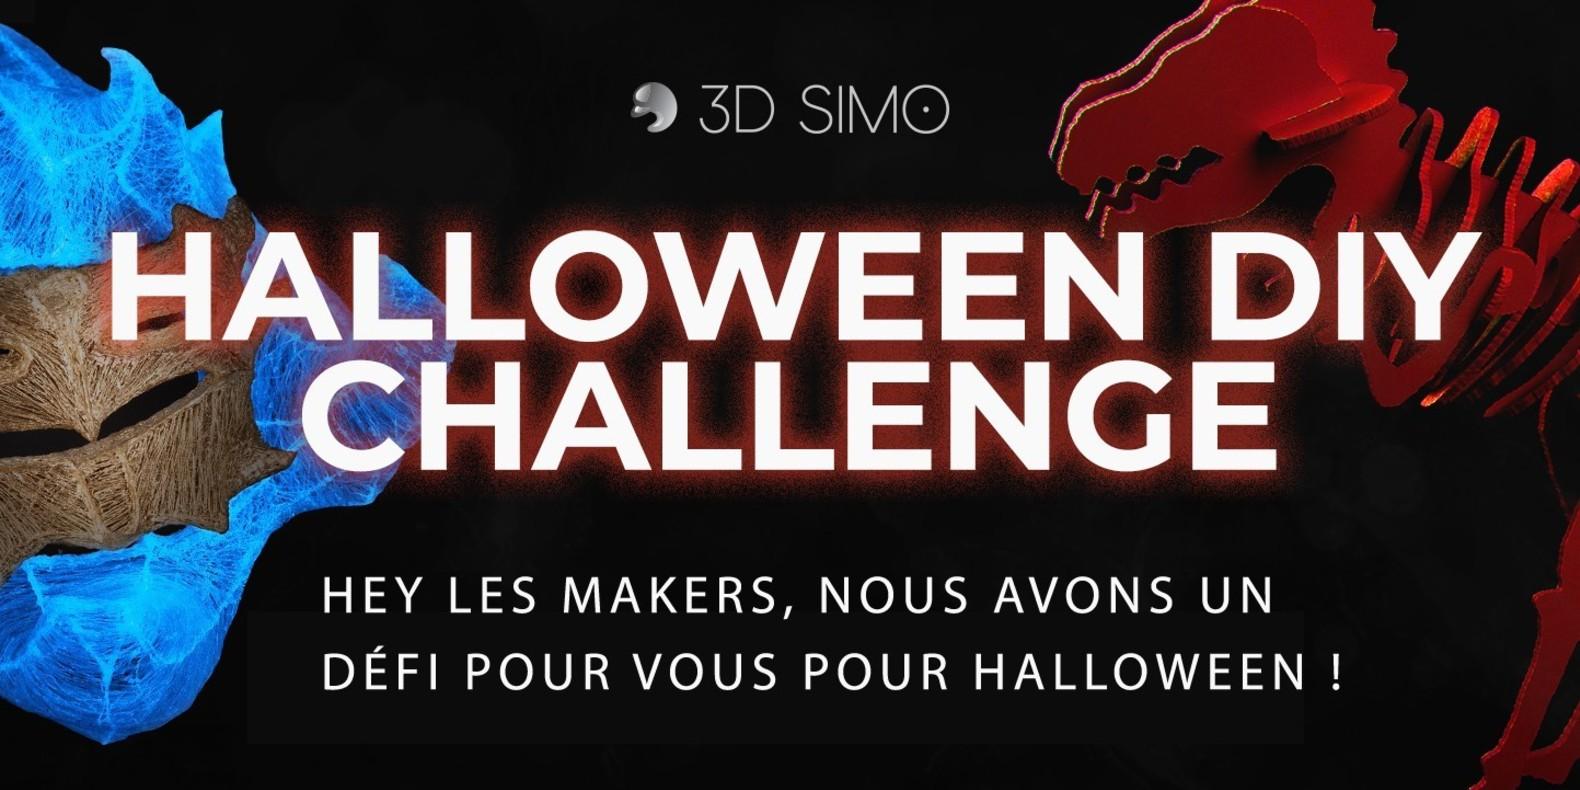 3D Simo Halloween Concours Impression 3D Bricolage